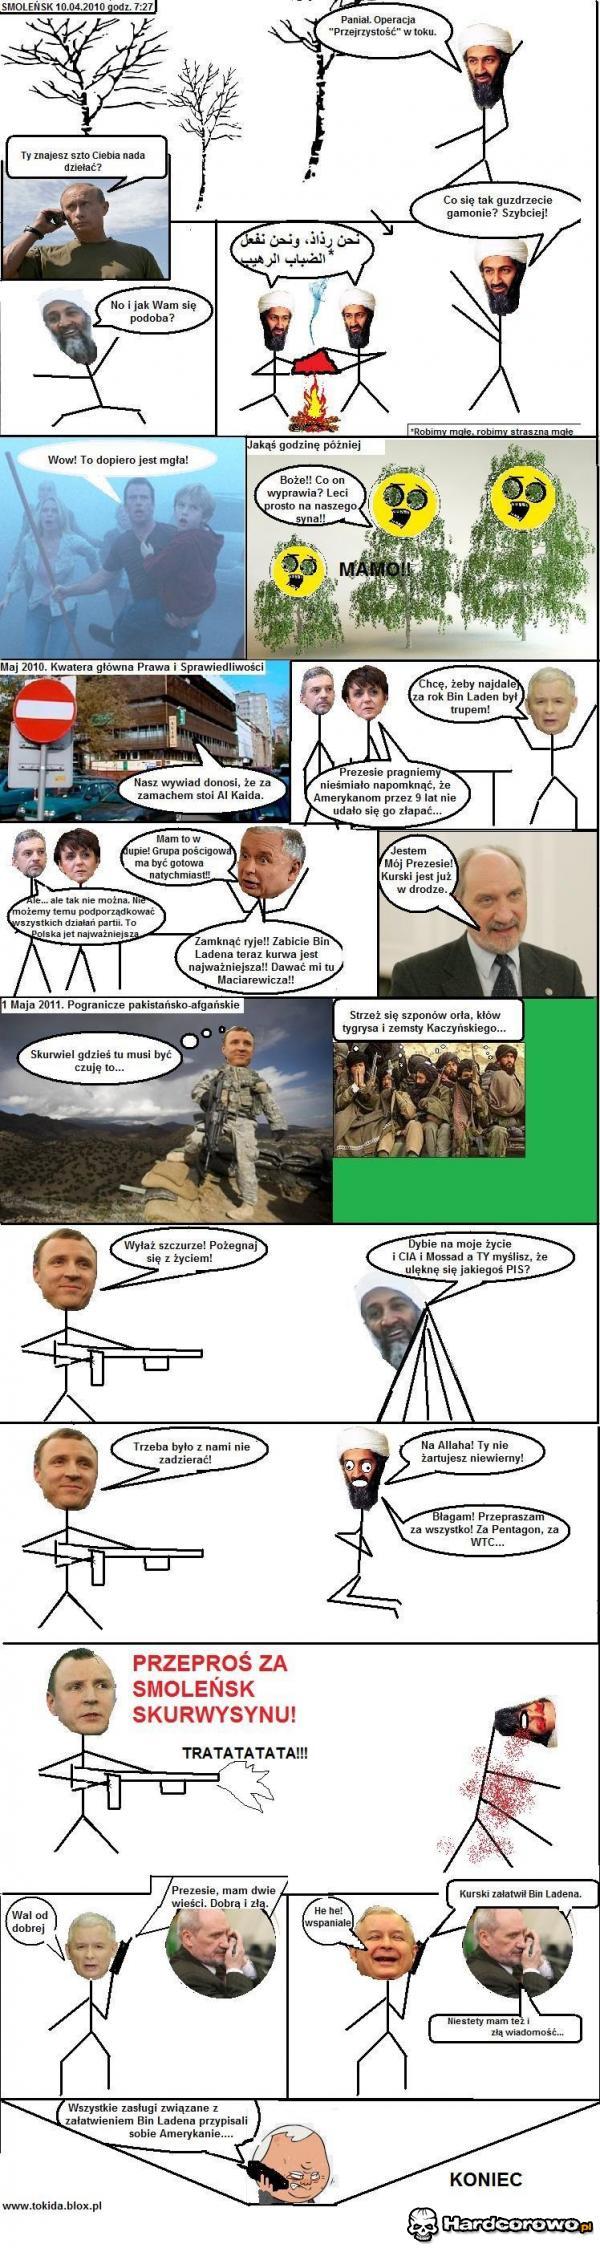 Tajemnica Smoleńska rozwiązana! - 1